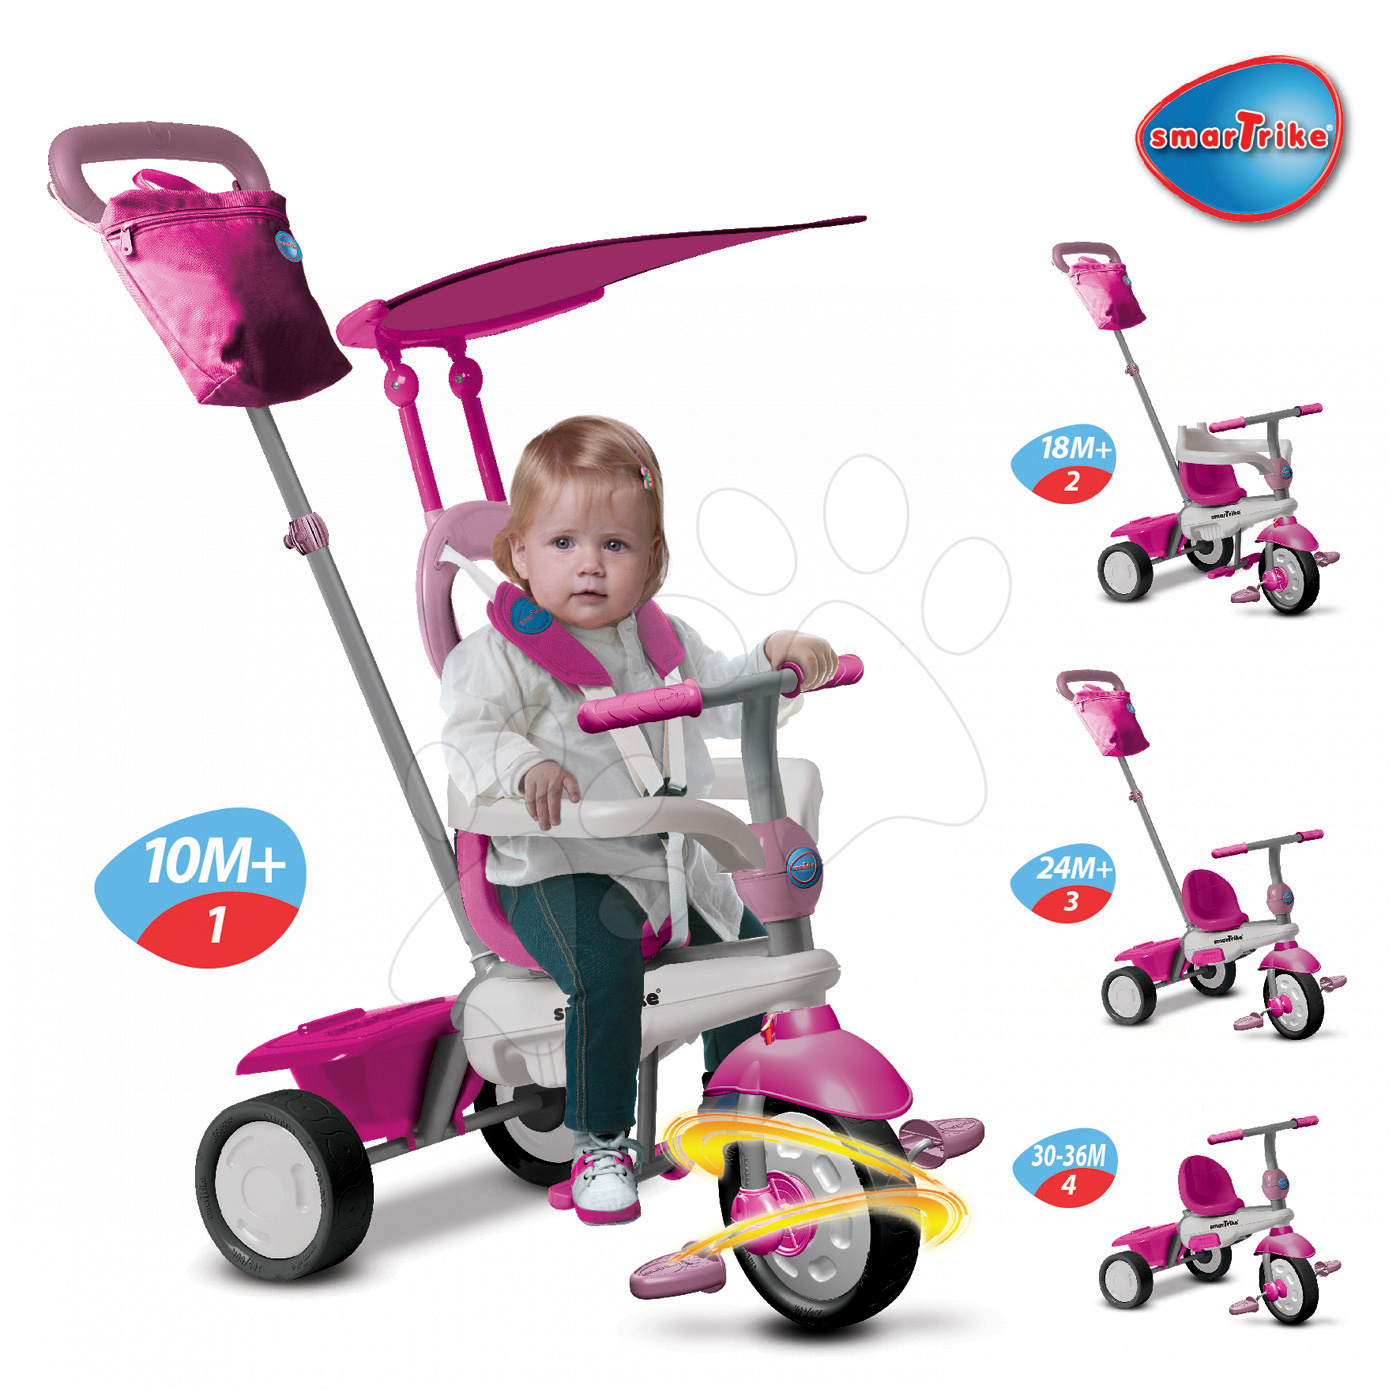 Trojkolky od 10 mesiacov - Trojkolka Joy Touch Steering smarTrike ružovo-biela od 10 mes